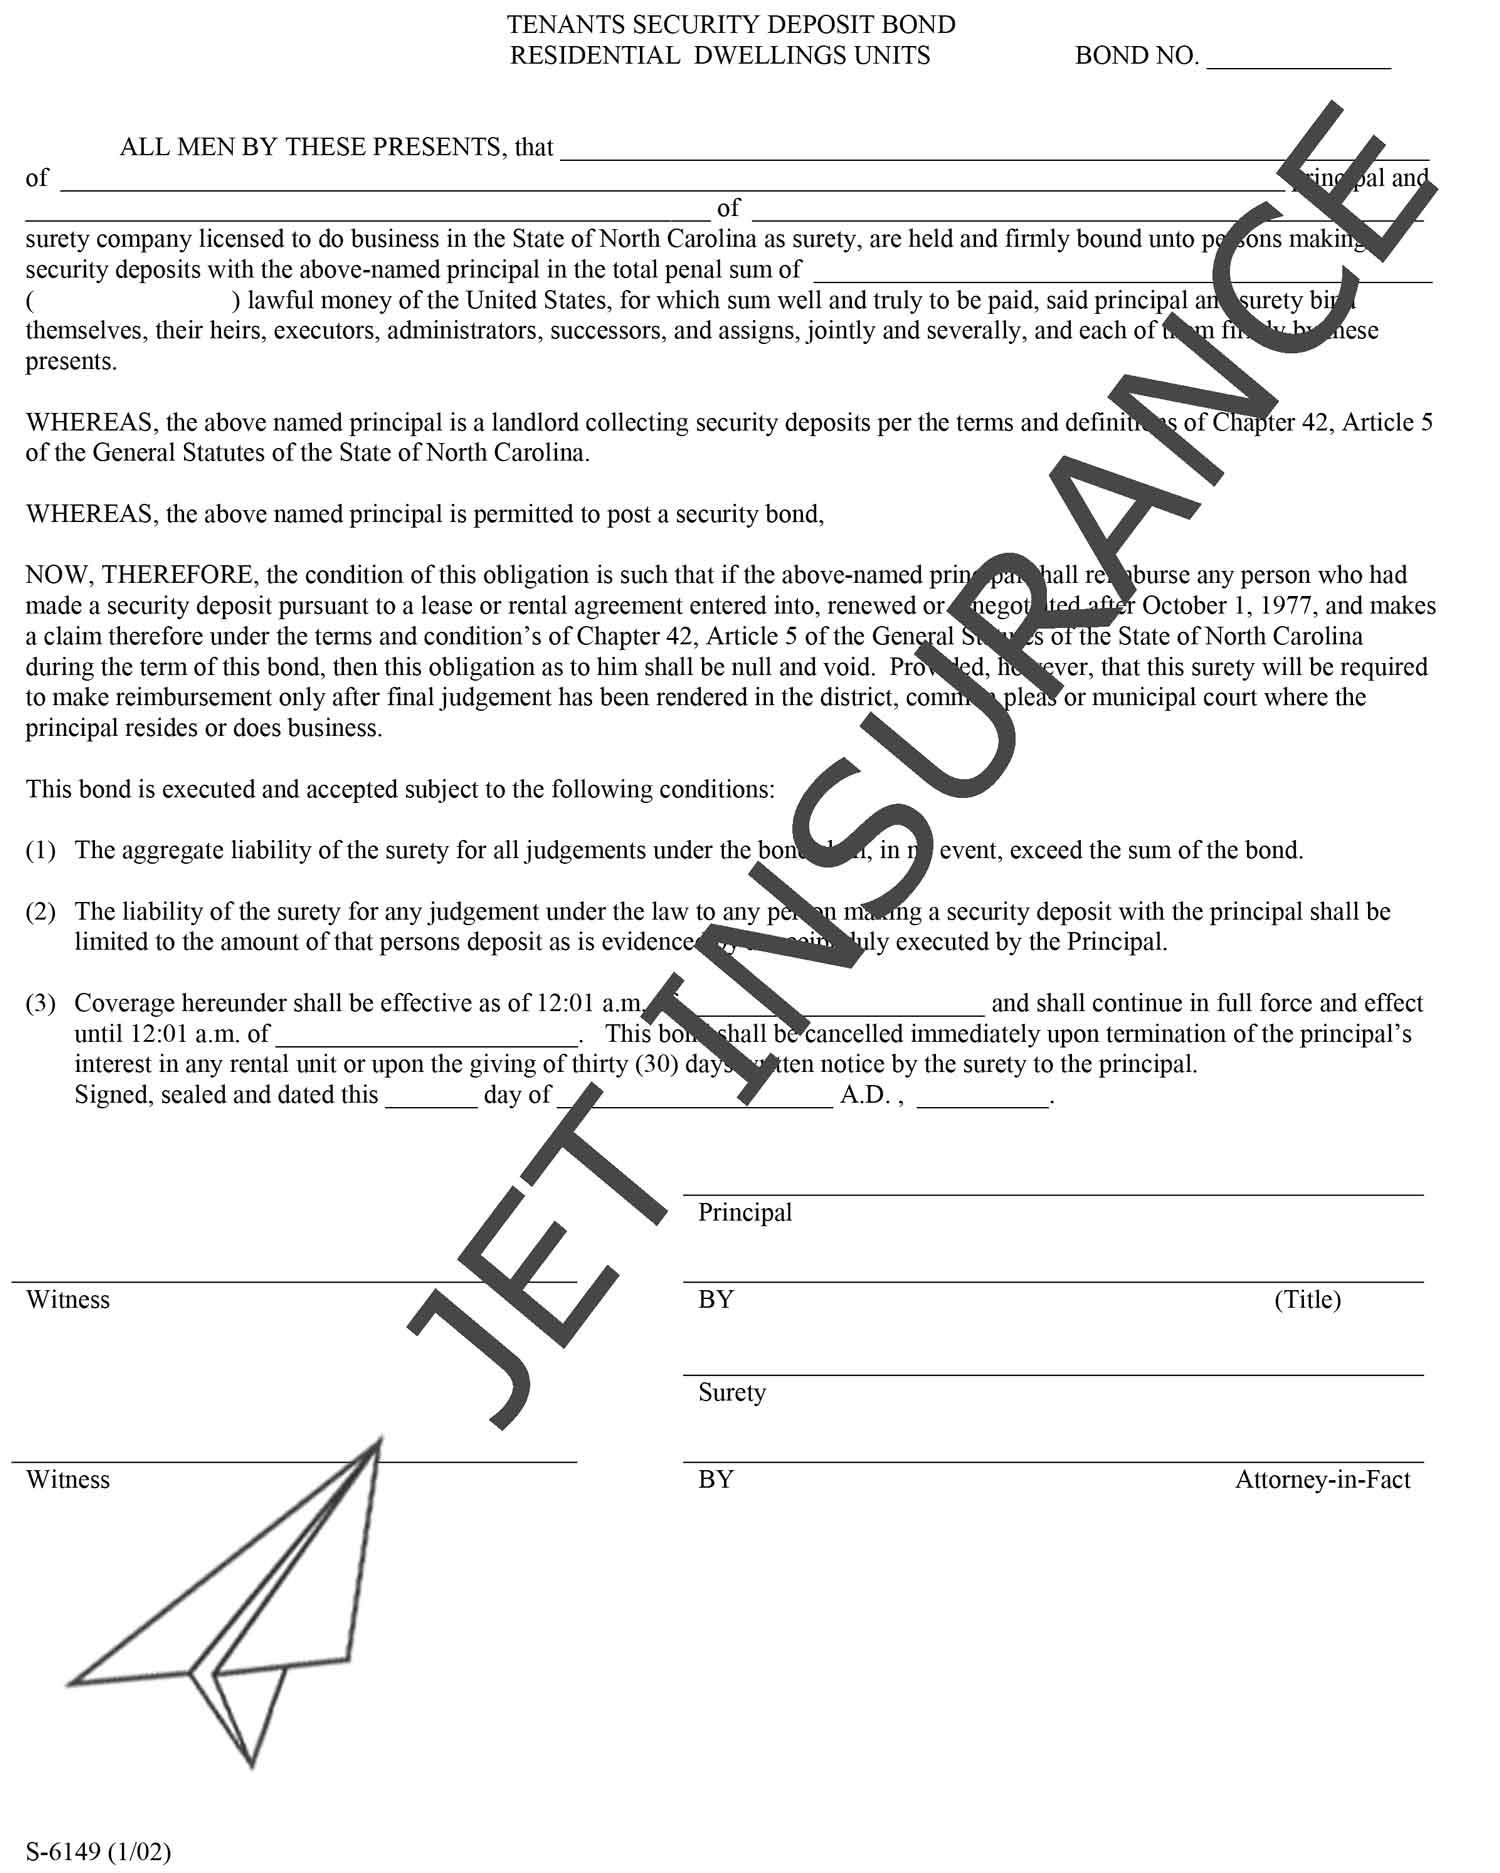 North Carolina Tenant Security Deposit Bond Form